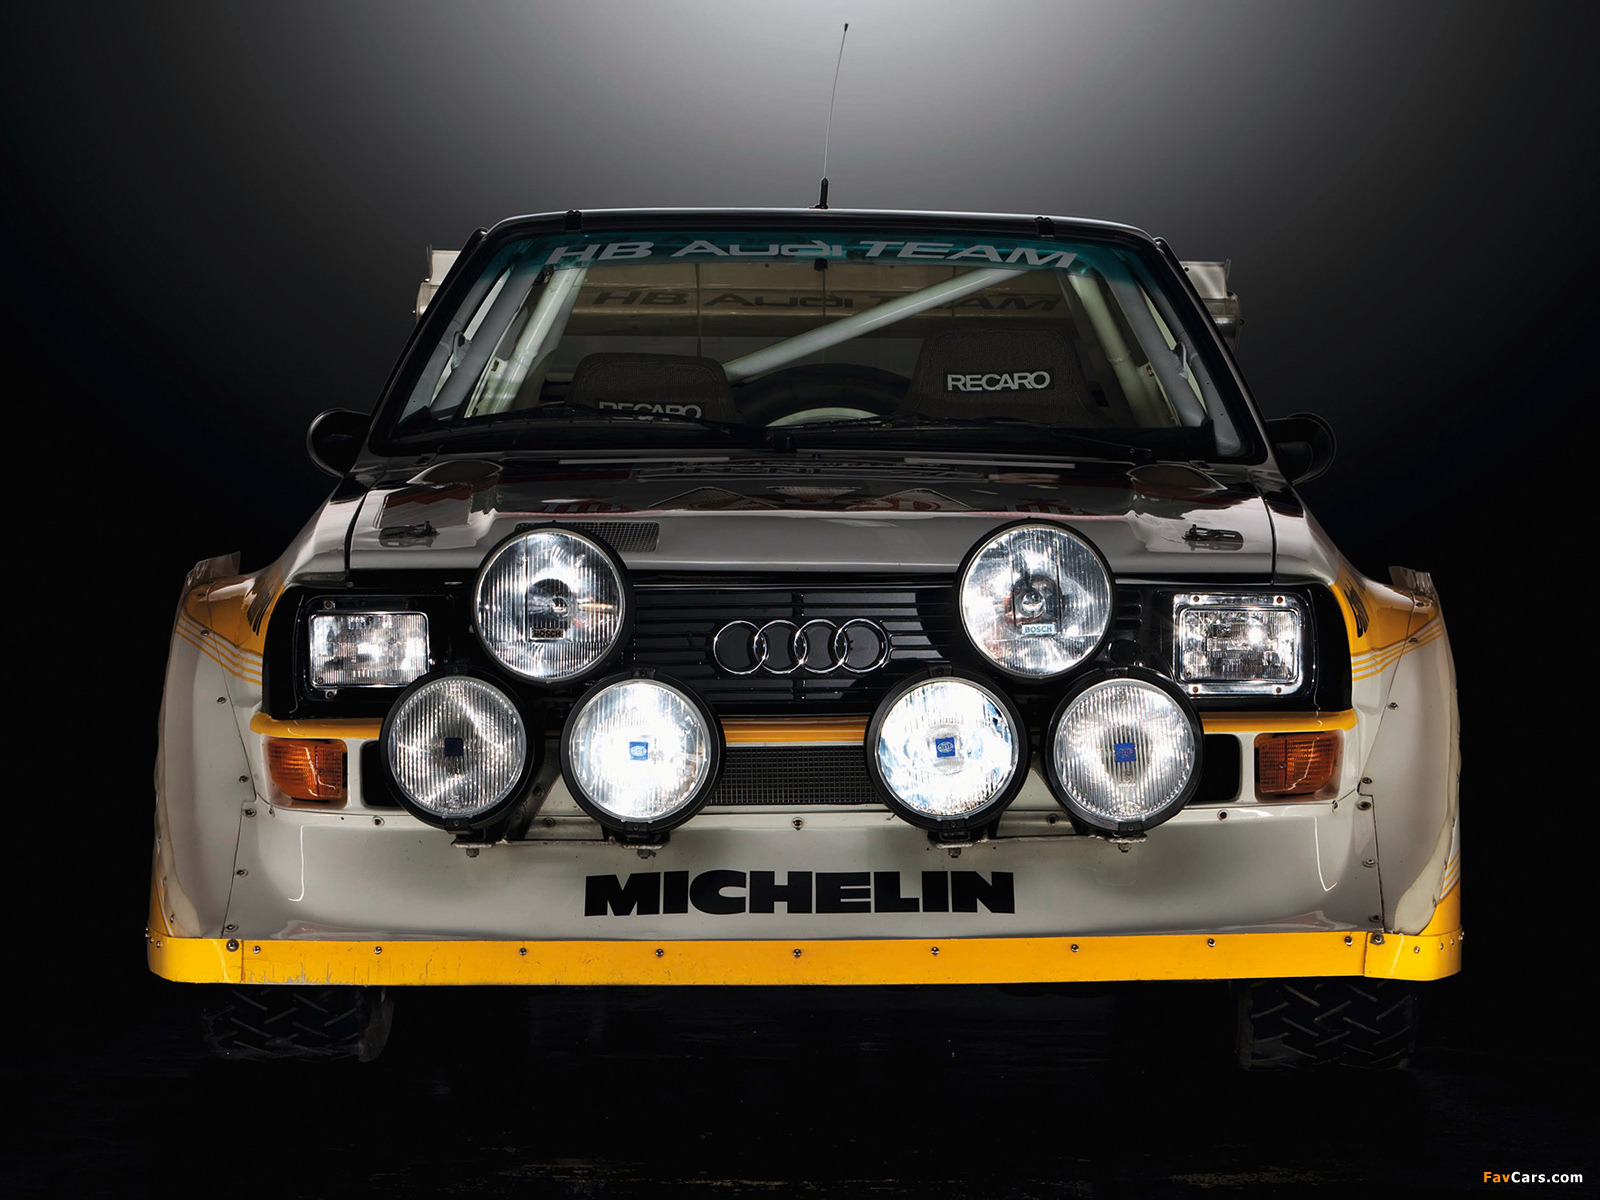 Sport Quattro S1 Group B Rally Car 198586 wallpapers 1600 x 1200 1600x1200